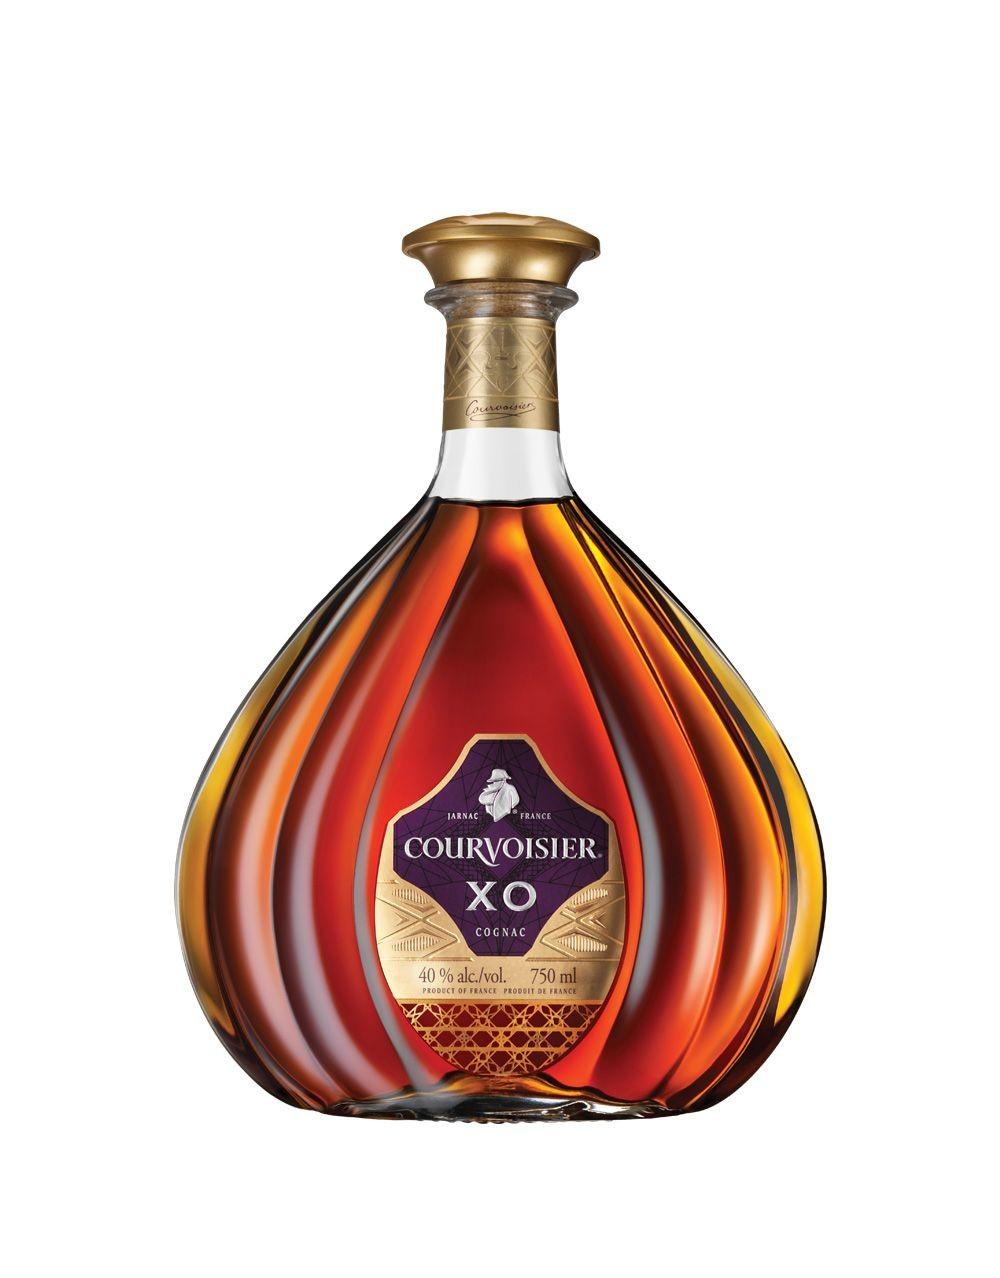 Courvoisier xo cognac buy online or send as a gift reservebar courvoisier xo cognac altavistaventures Images